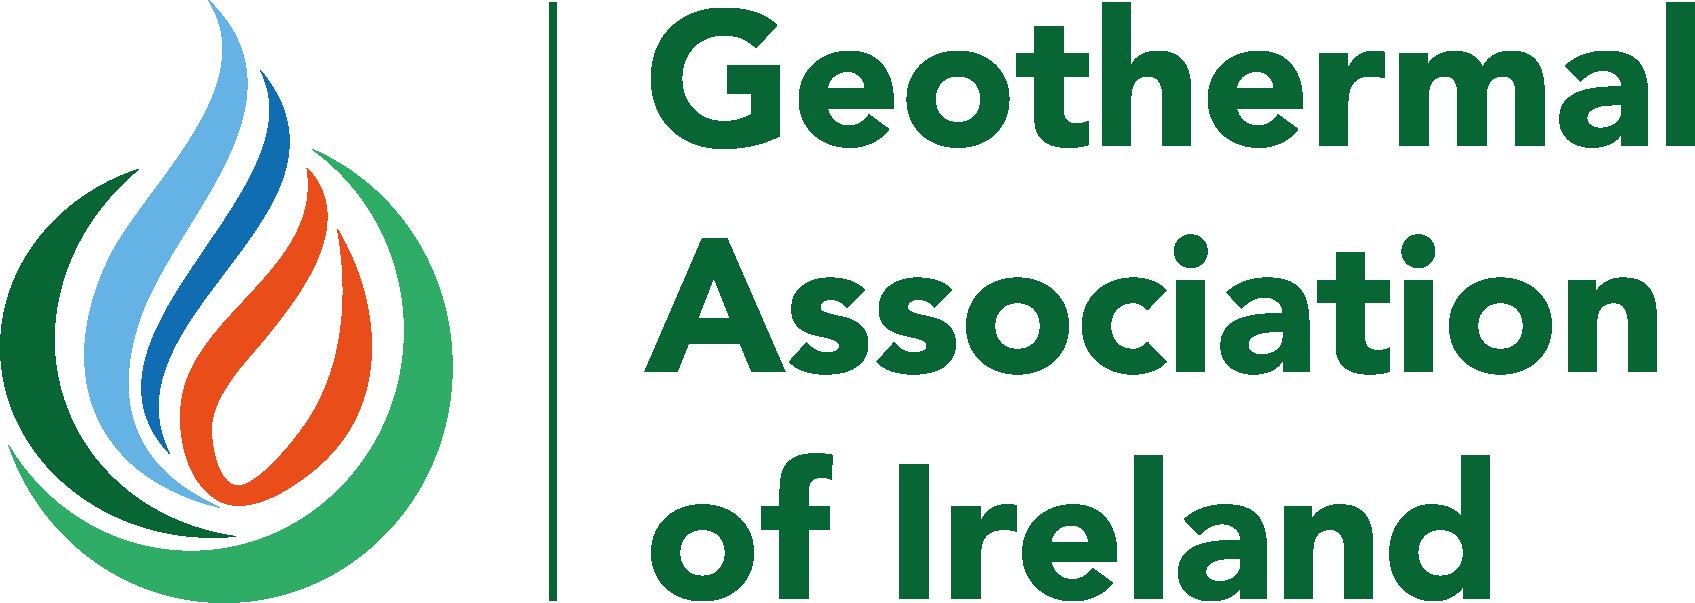 Geothermal Association of Ireland